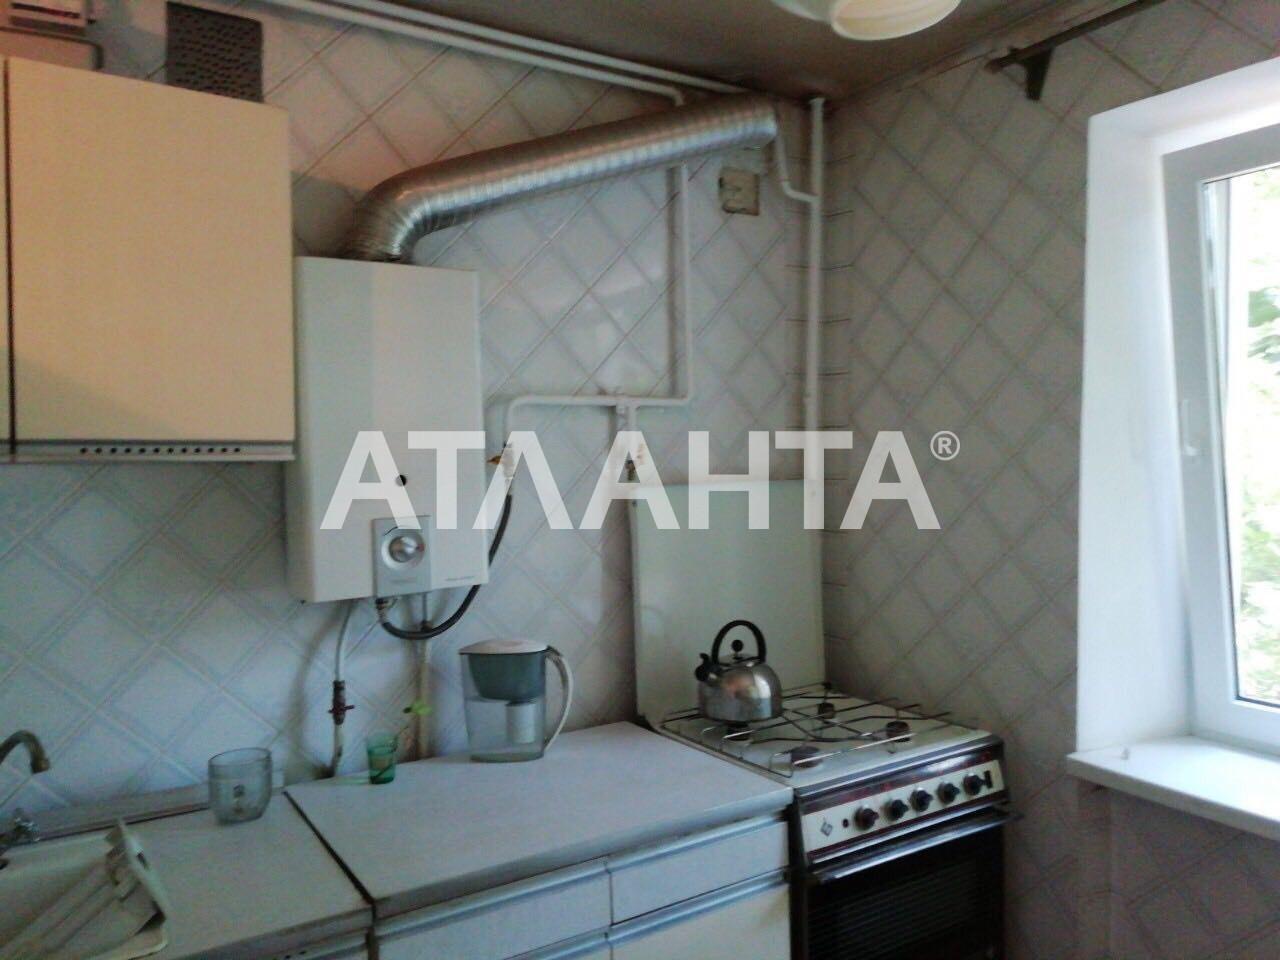 Продается 2-комнатная Квартира на ул. Артиллерийский 2-Й Пер. — 38 700 у.е. (фото №8)